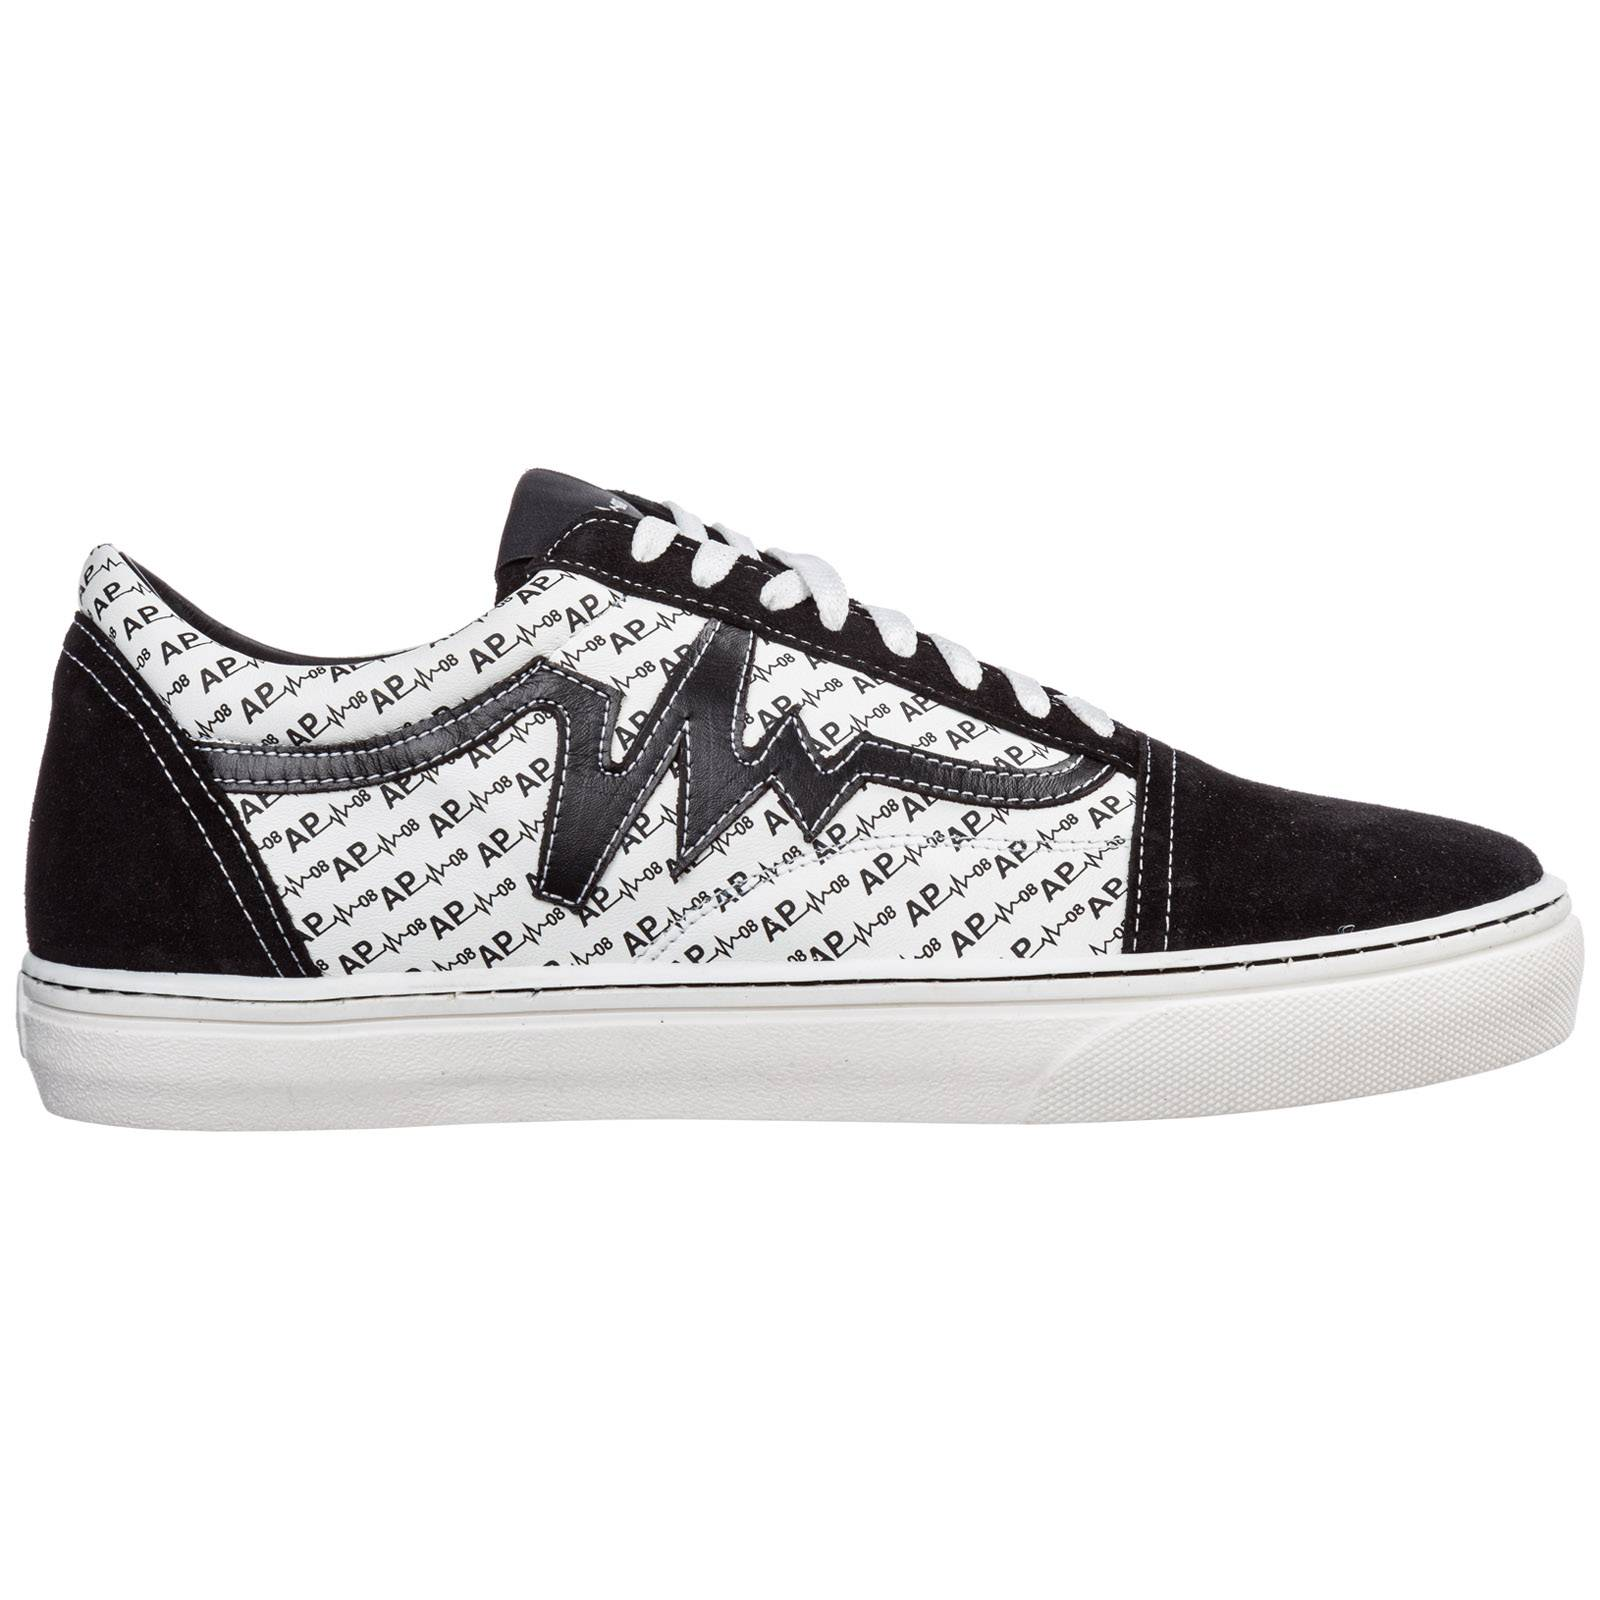 AP08 Scarpe sneakers donna in pelle monogram